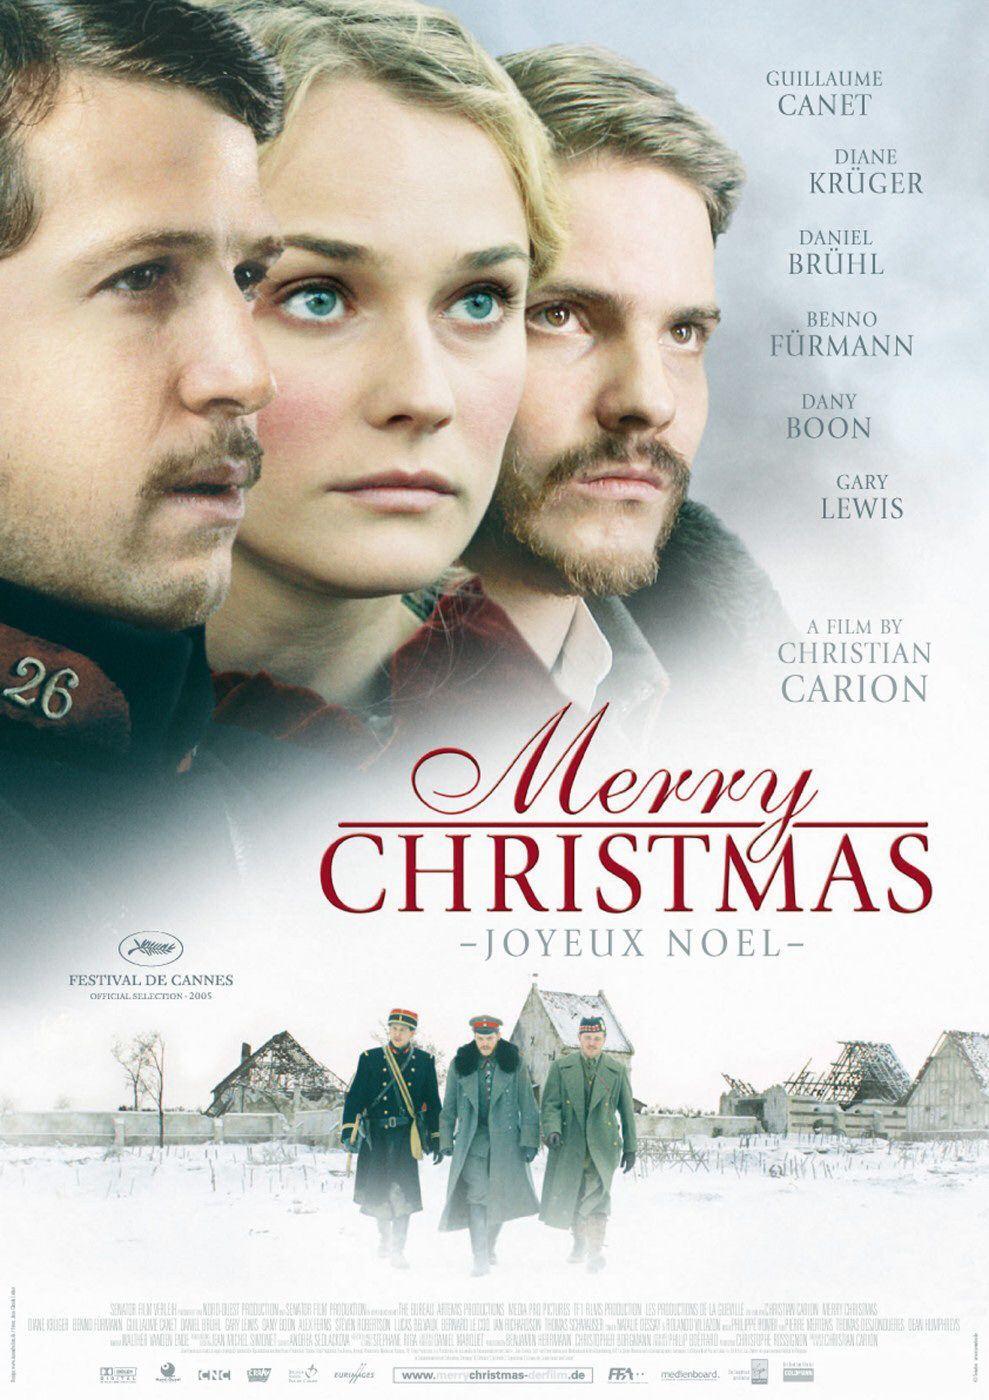 http://image.xyface.com/image/m/movie-merry-christmas/merry-christmas-137102.jpg